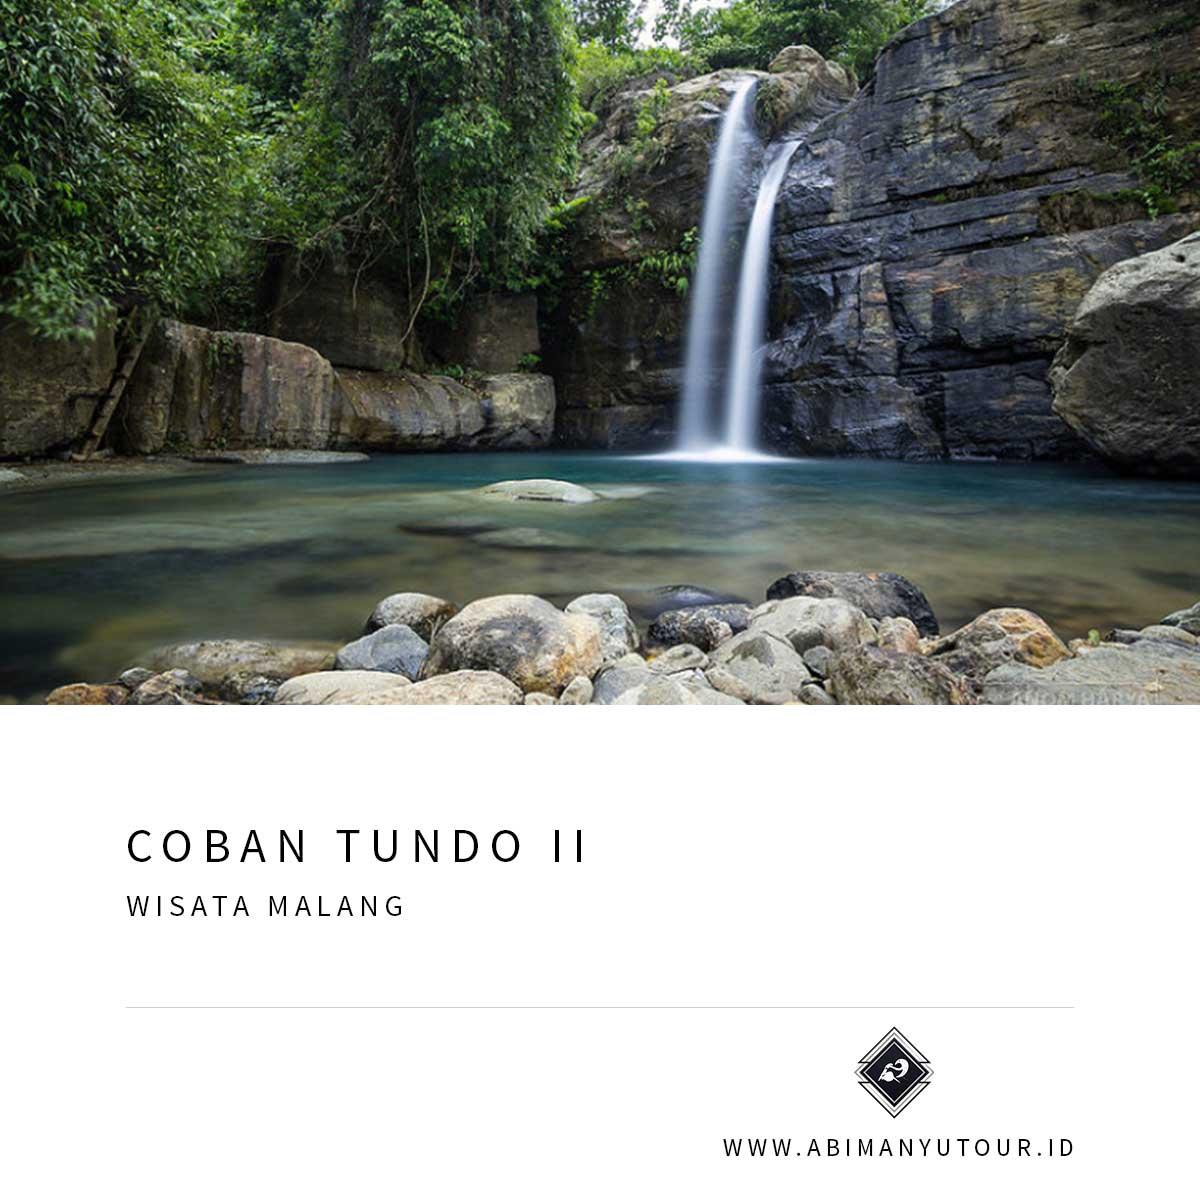 WISATA MALANG COBAN TUNDO II